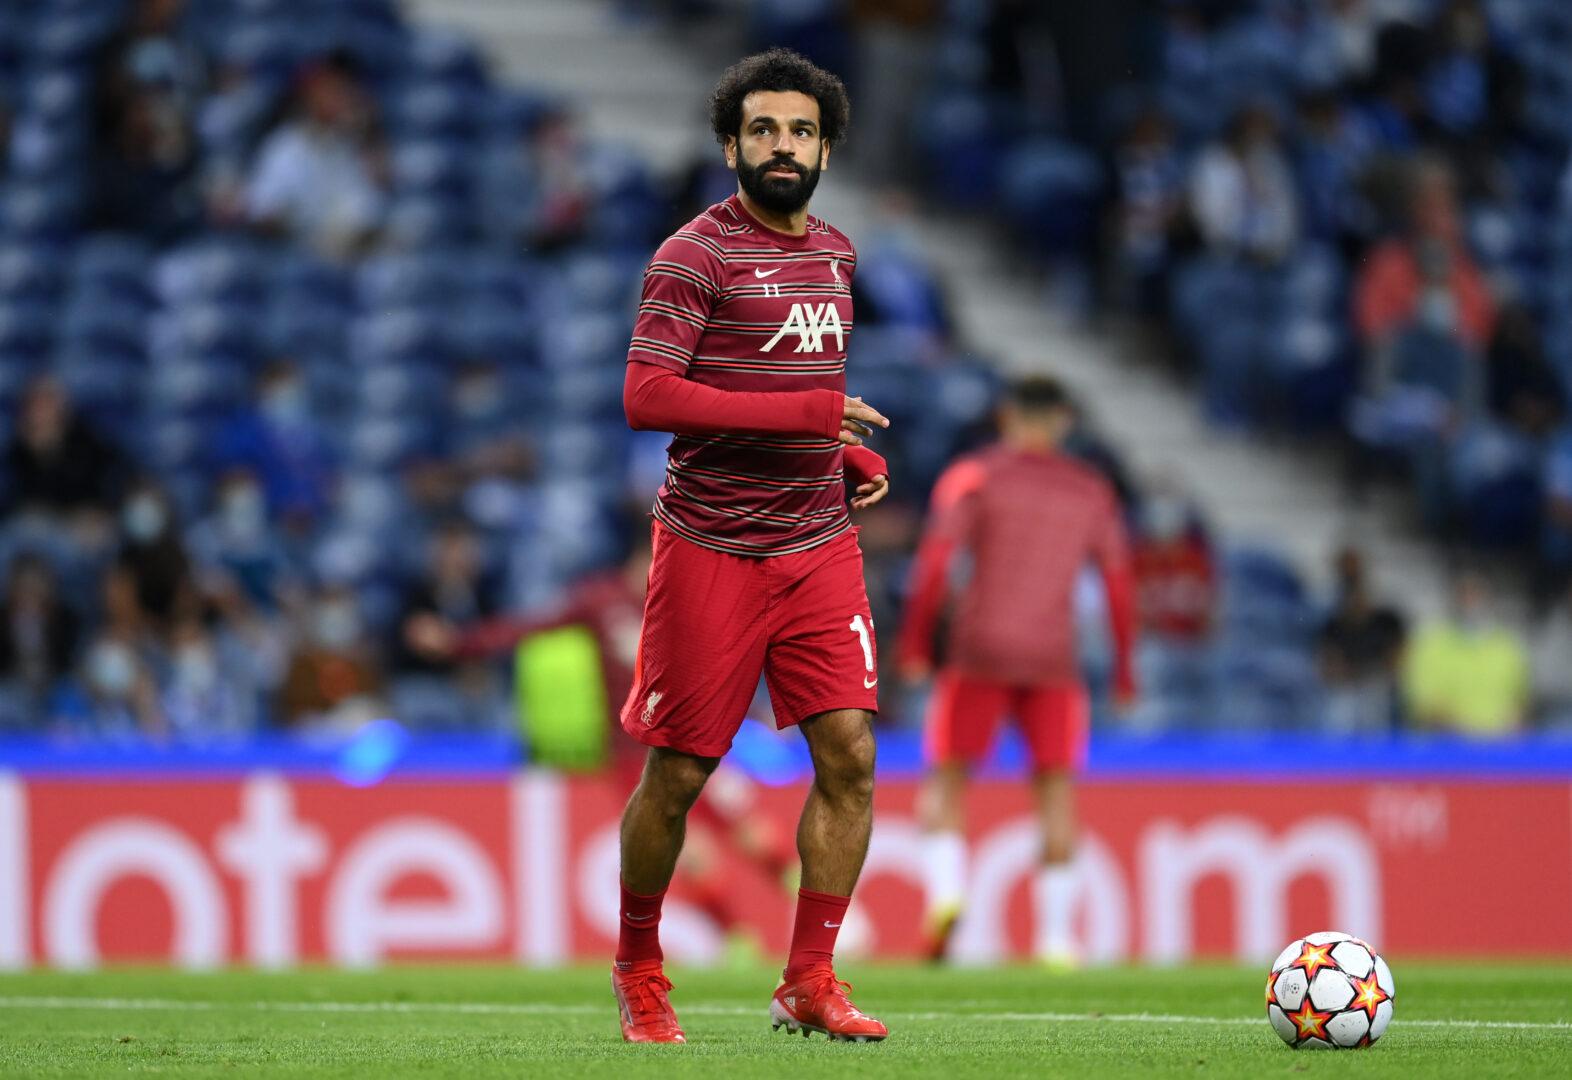 Liverpool-Star Mo Salah beim Aufwärmen.